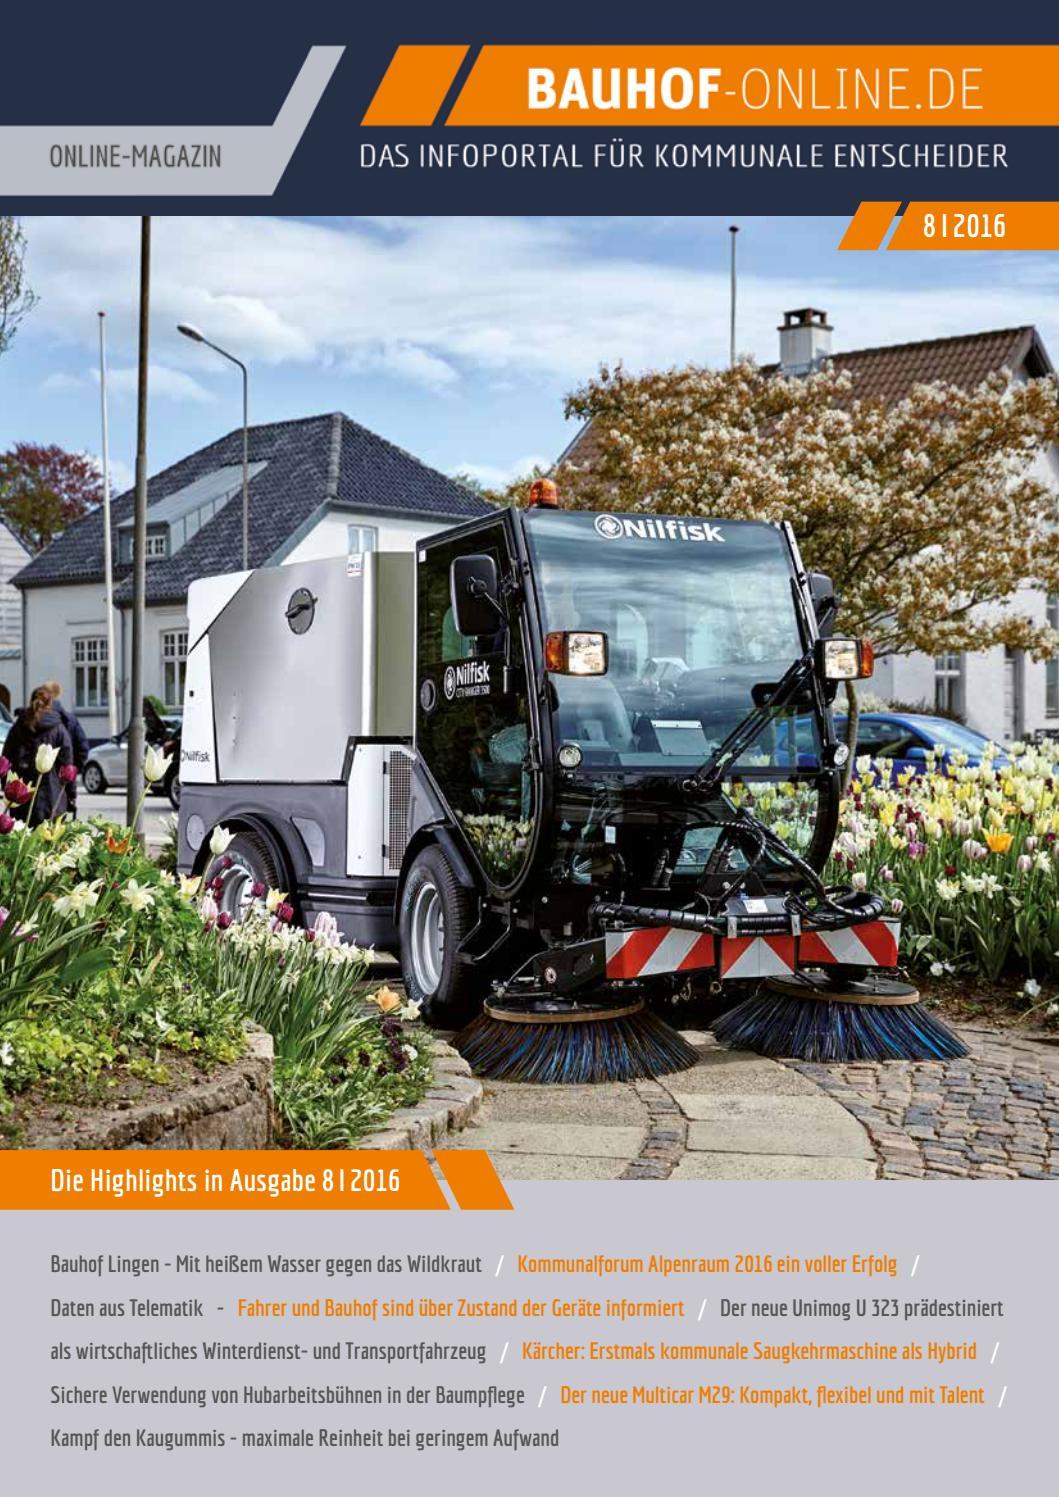 Bauhof-Online Magazin 08/2016 by KANAT Media Verlag - issuu